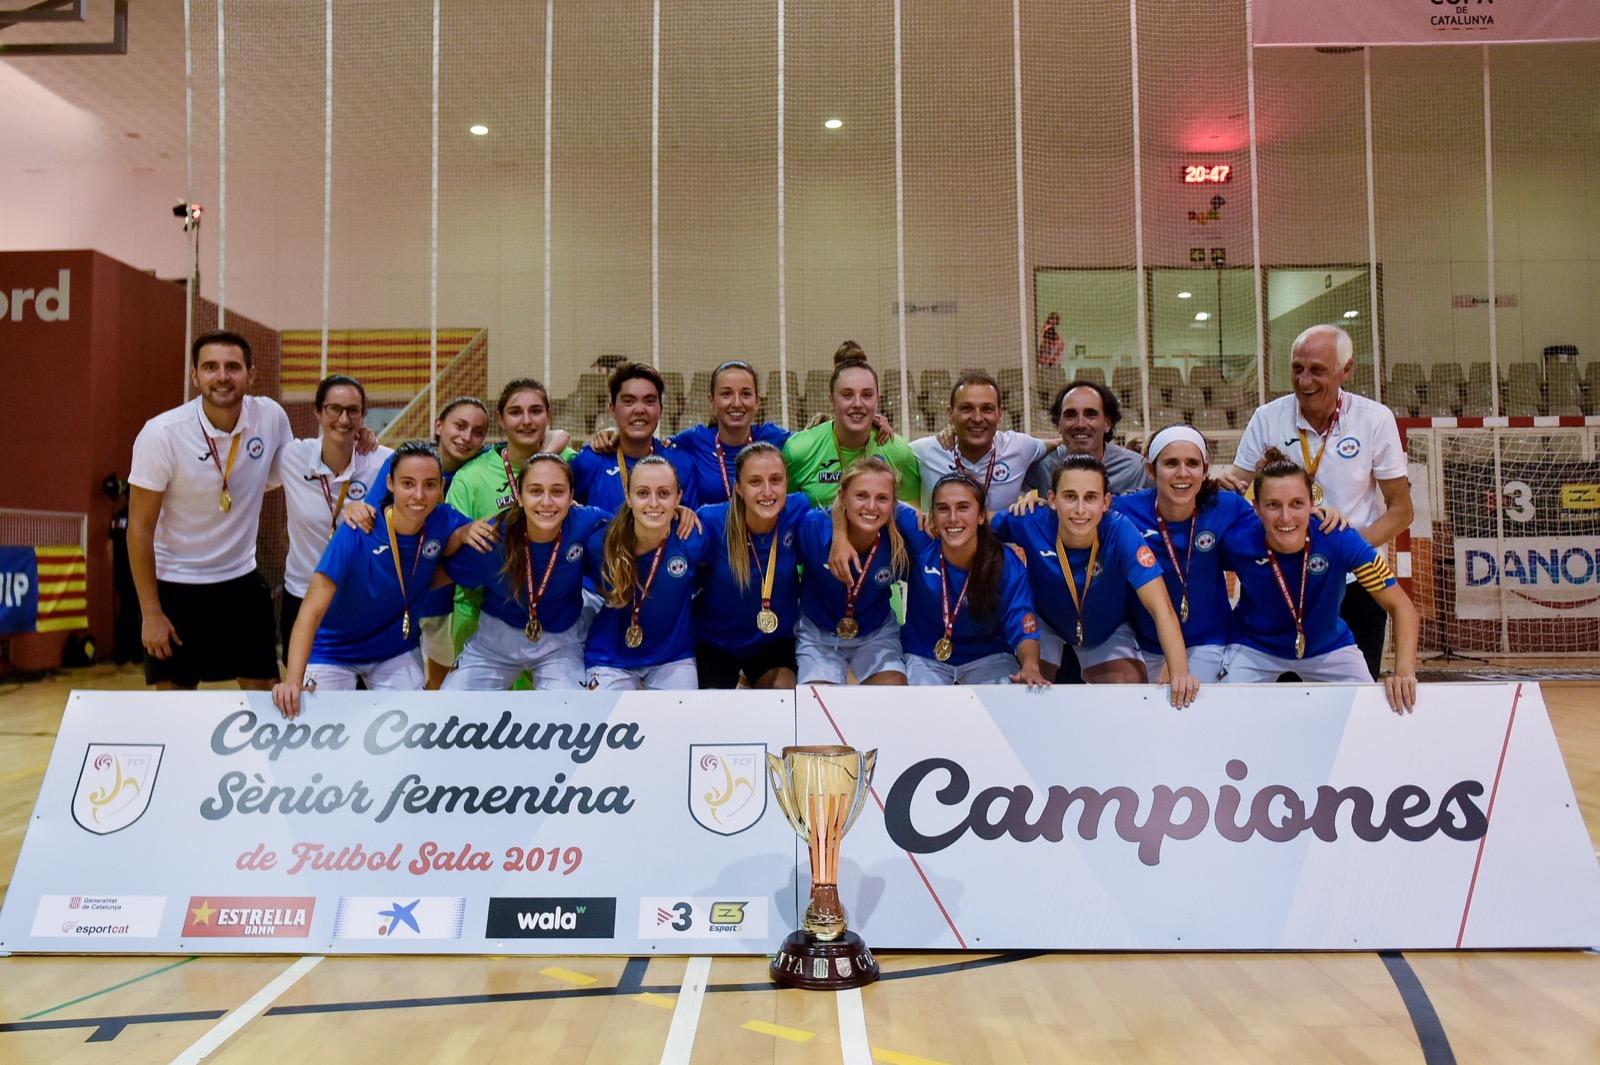 20190911 Copa Catalunya Senior Femenina Futbol Sala